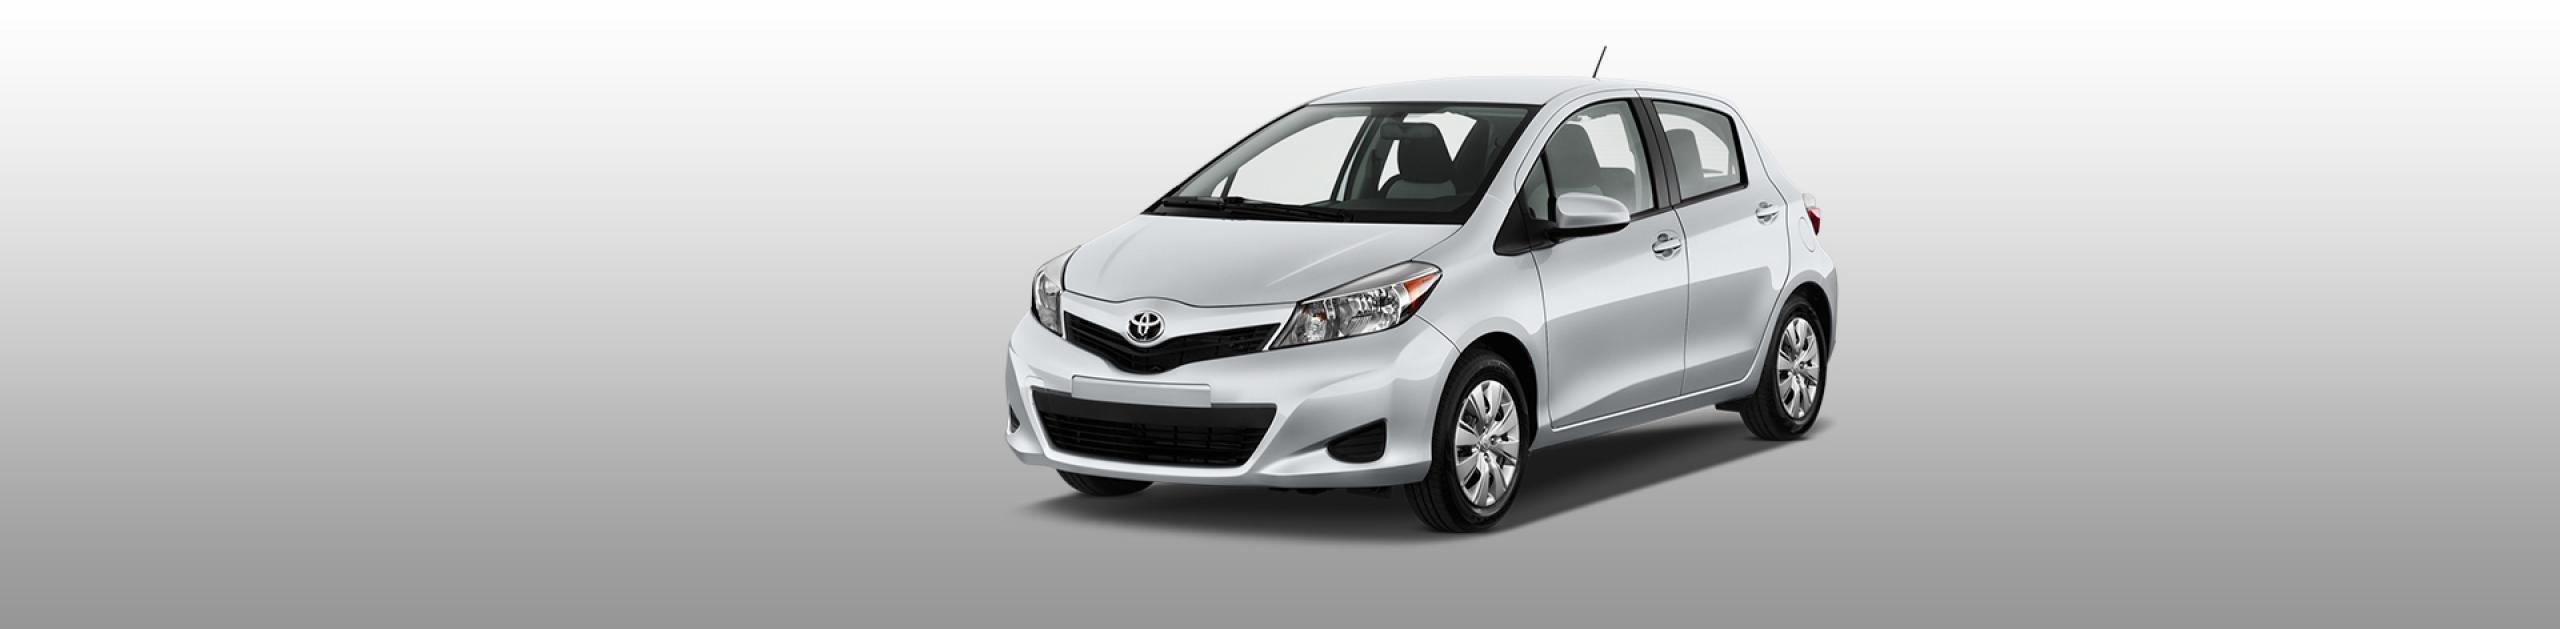 Lesvos Car Hire - Toyota Yaris Automatic